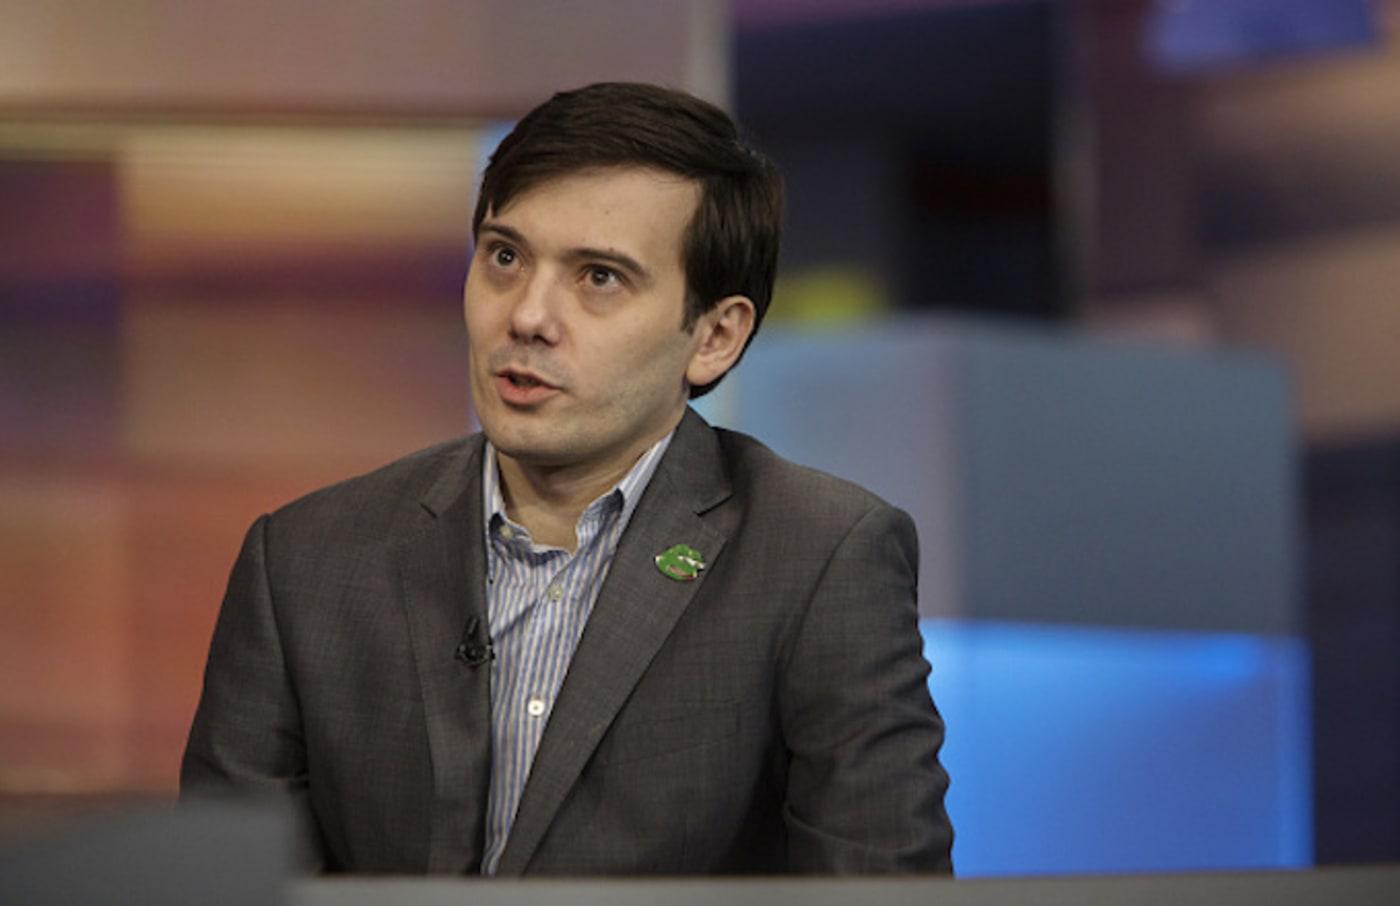 Martin Shkreli speaks during a Bloomberg Television